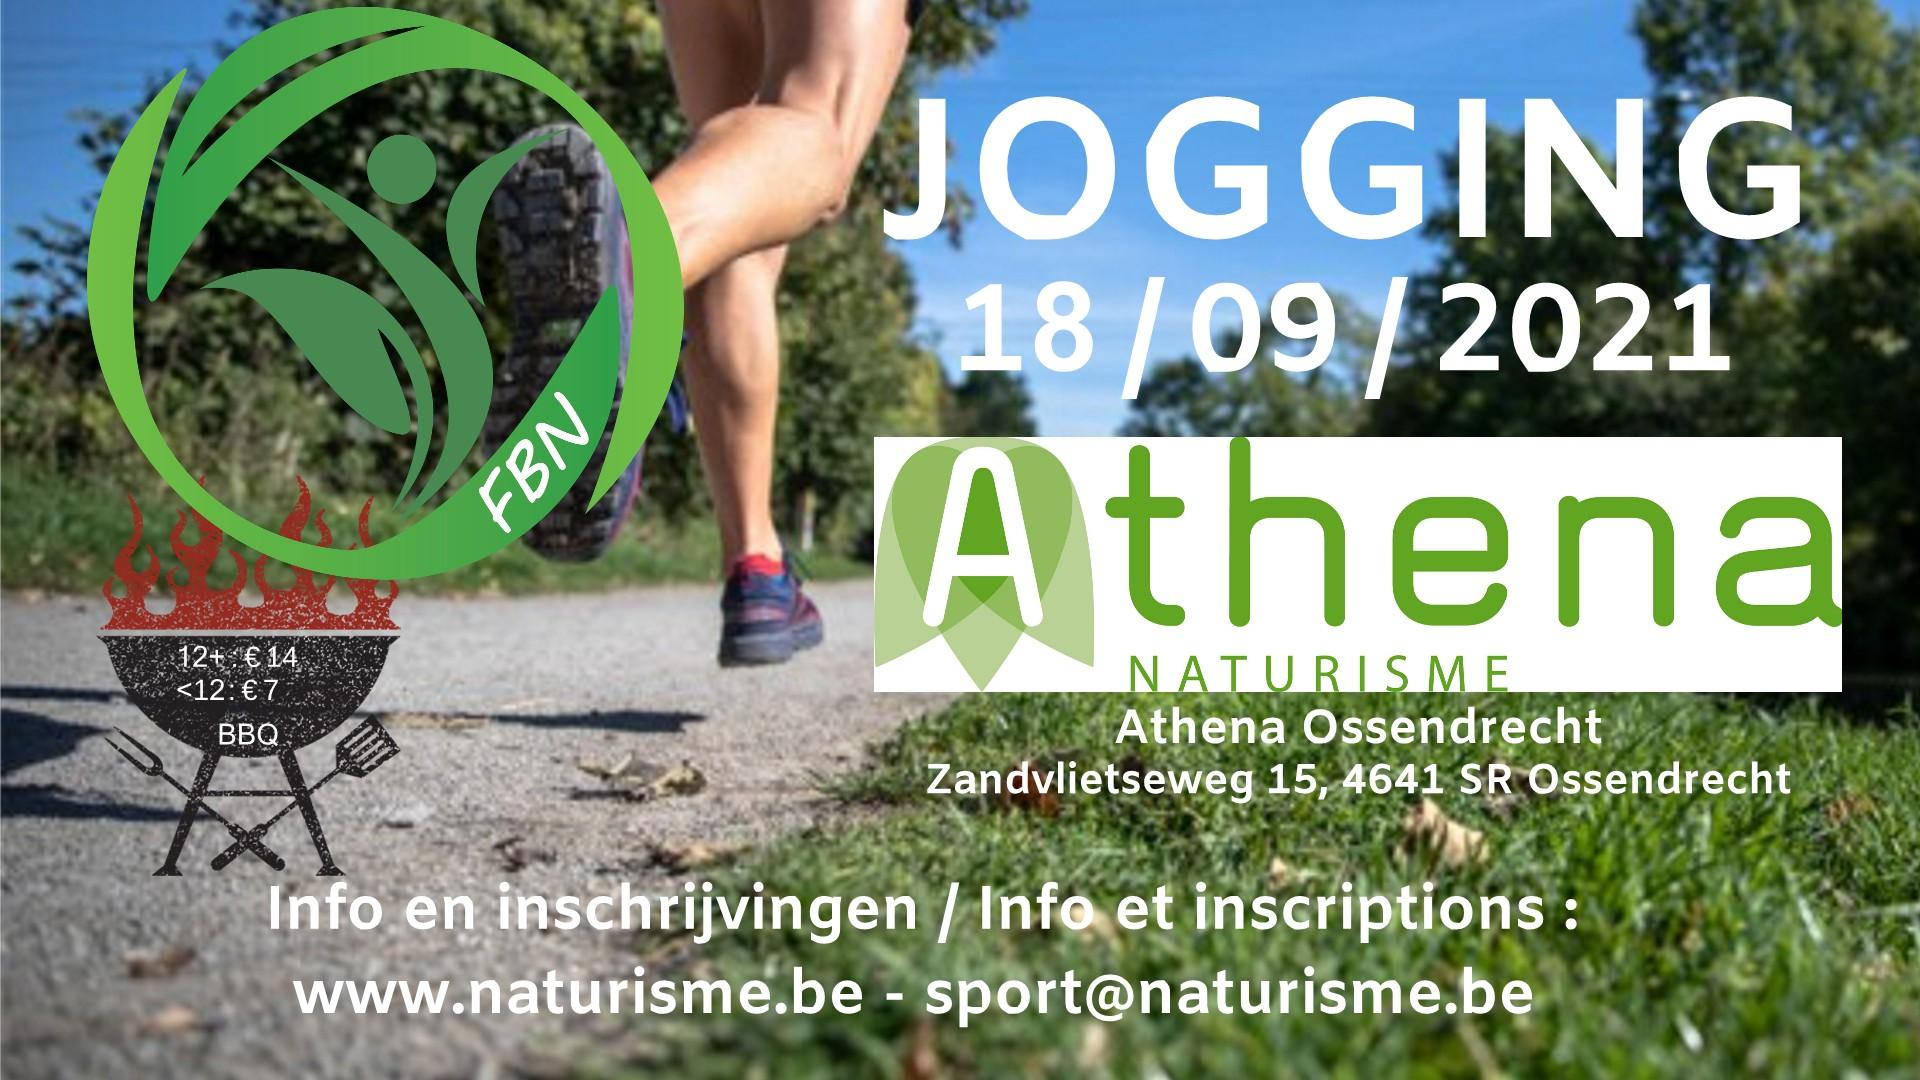 FBN Jogging te Athena Ossendrecht